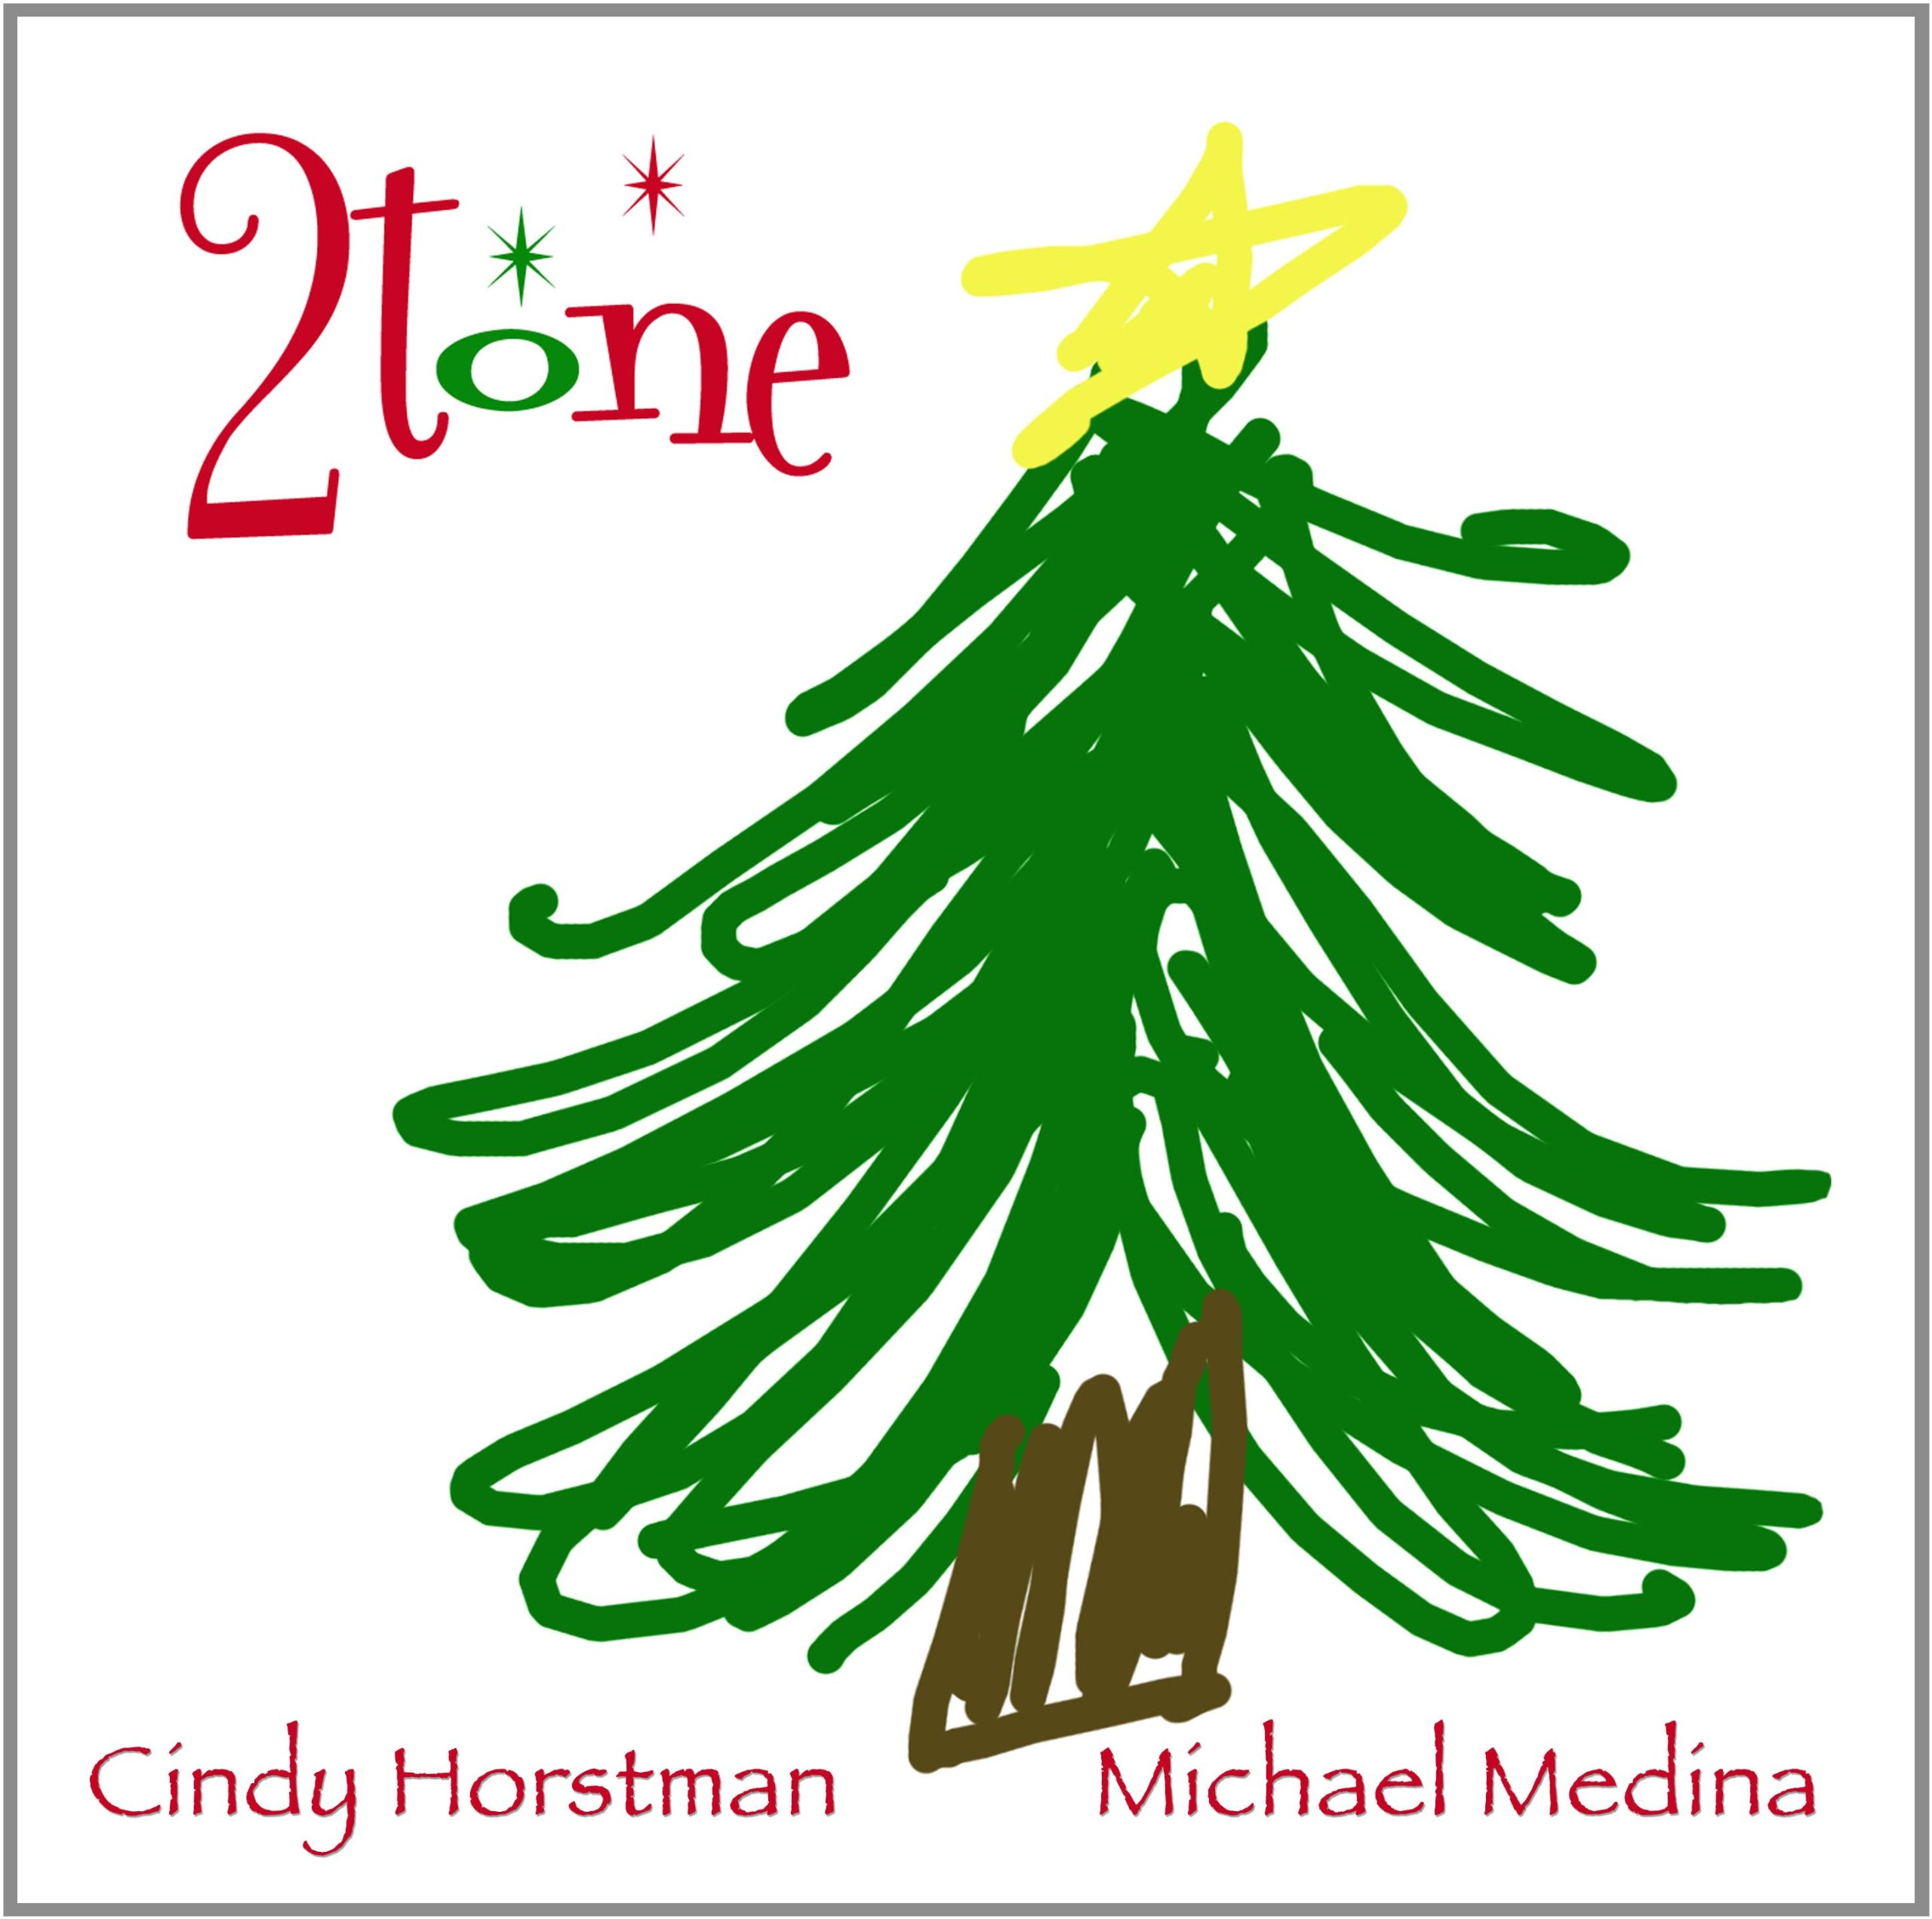 CD : Michael Medina - 2tone Christmas (CD)